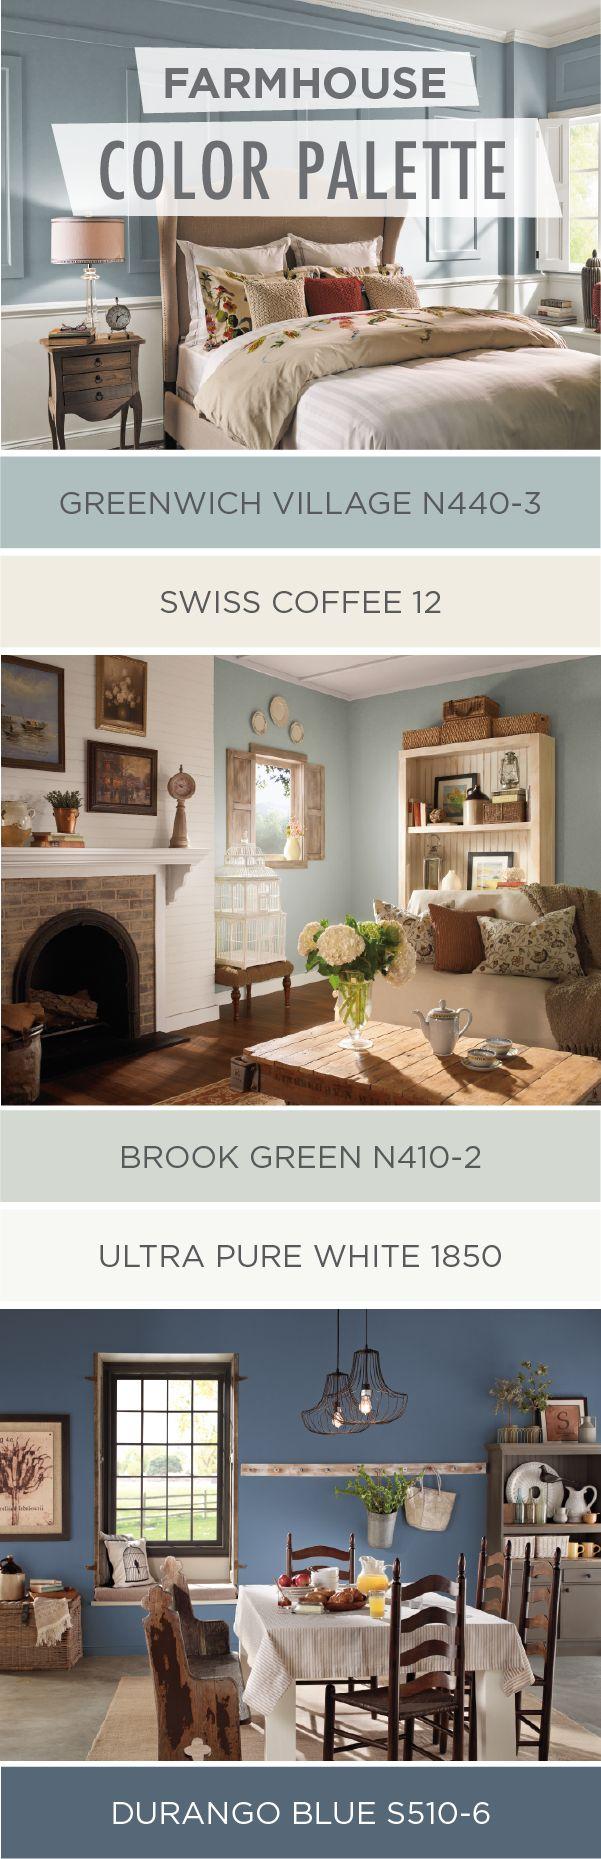 Best 25+ Rustic color palettes ideas on Pinterest | Rustic ...